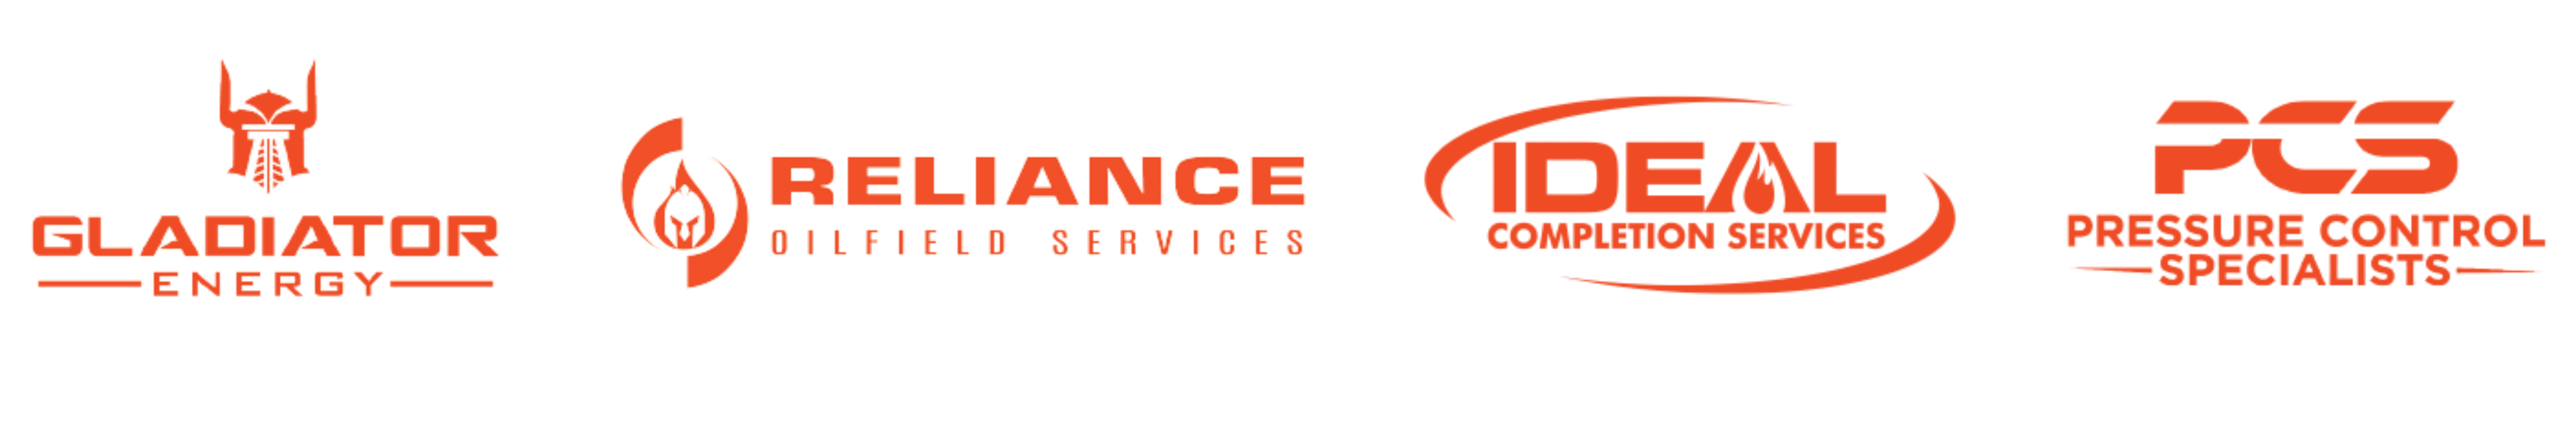 Edge OFS logo